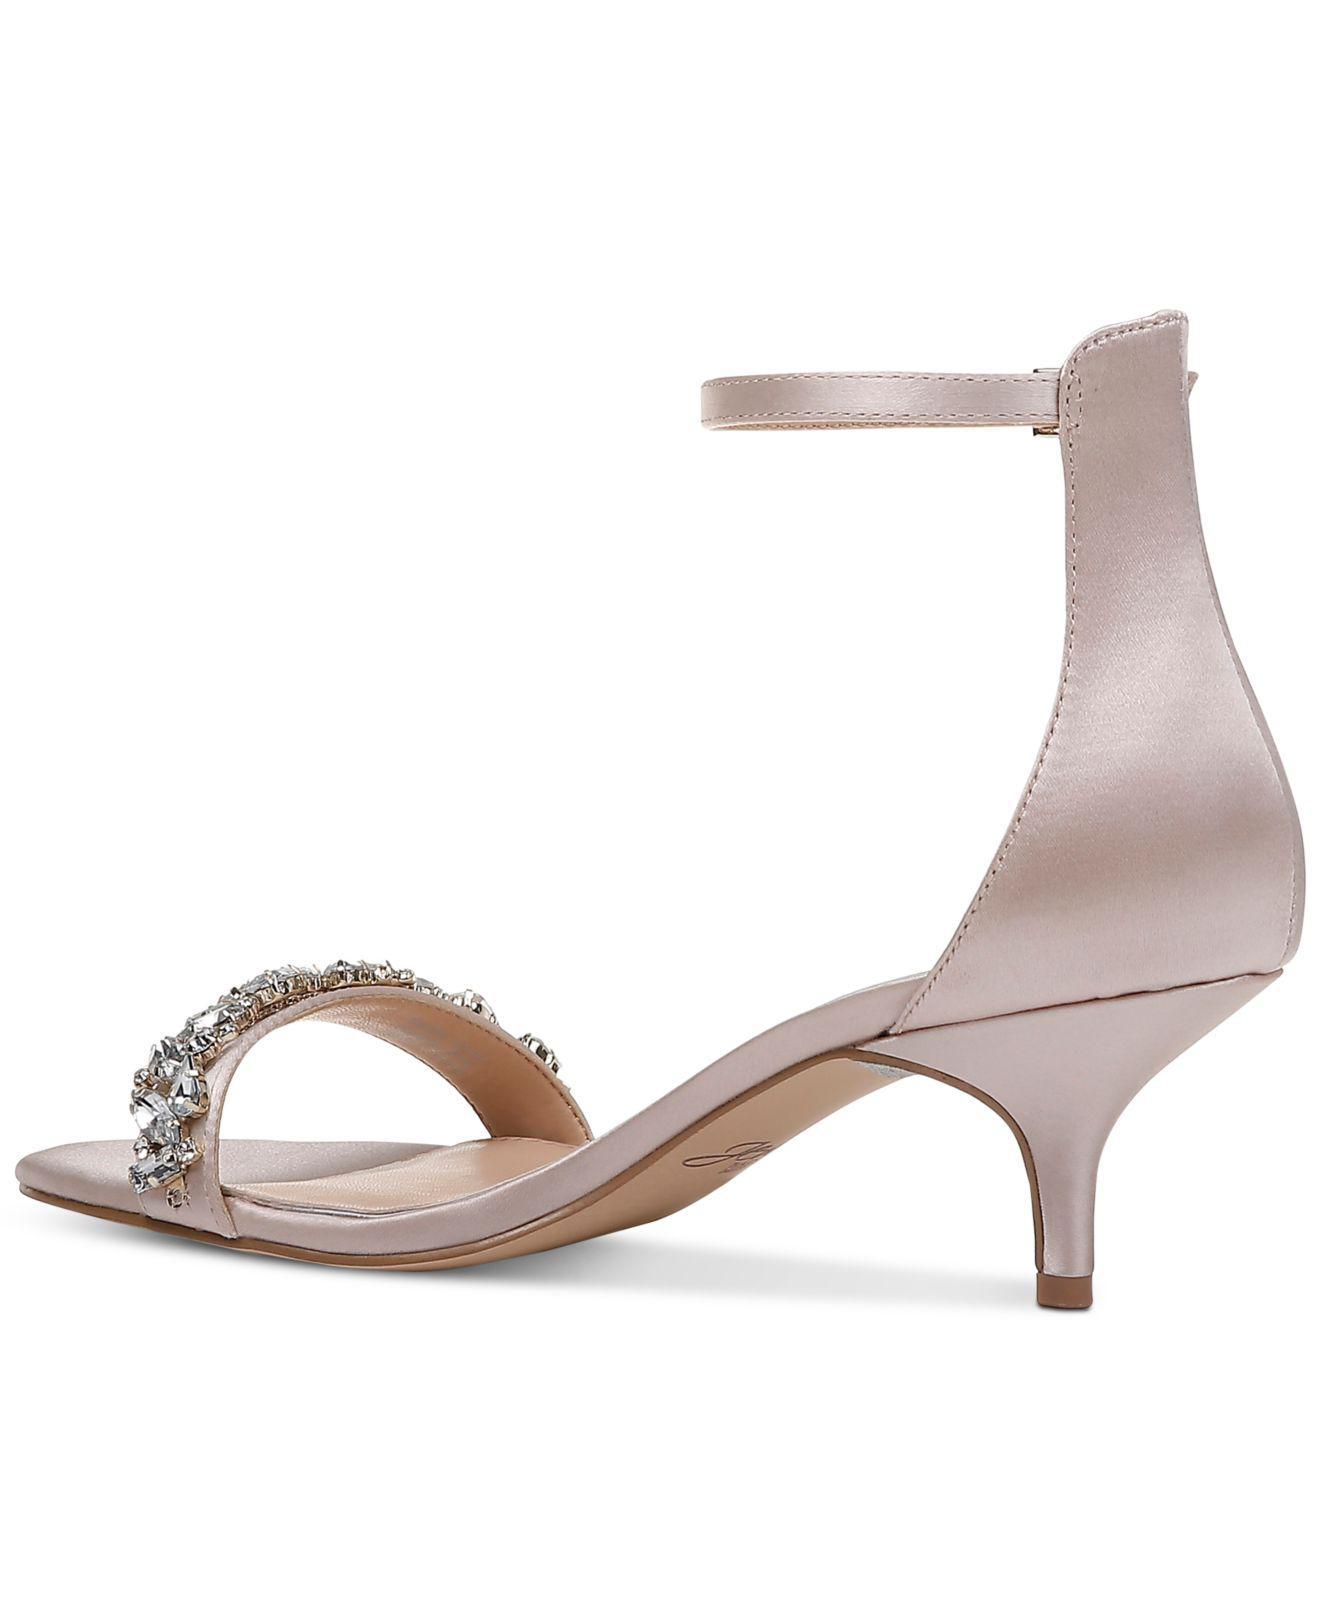 5c6a7eaf6516 Badgley Mischka - Multicolor Dash Kitten-heel Evening Sandals - Lyst. View  fullscreen